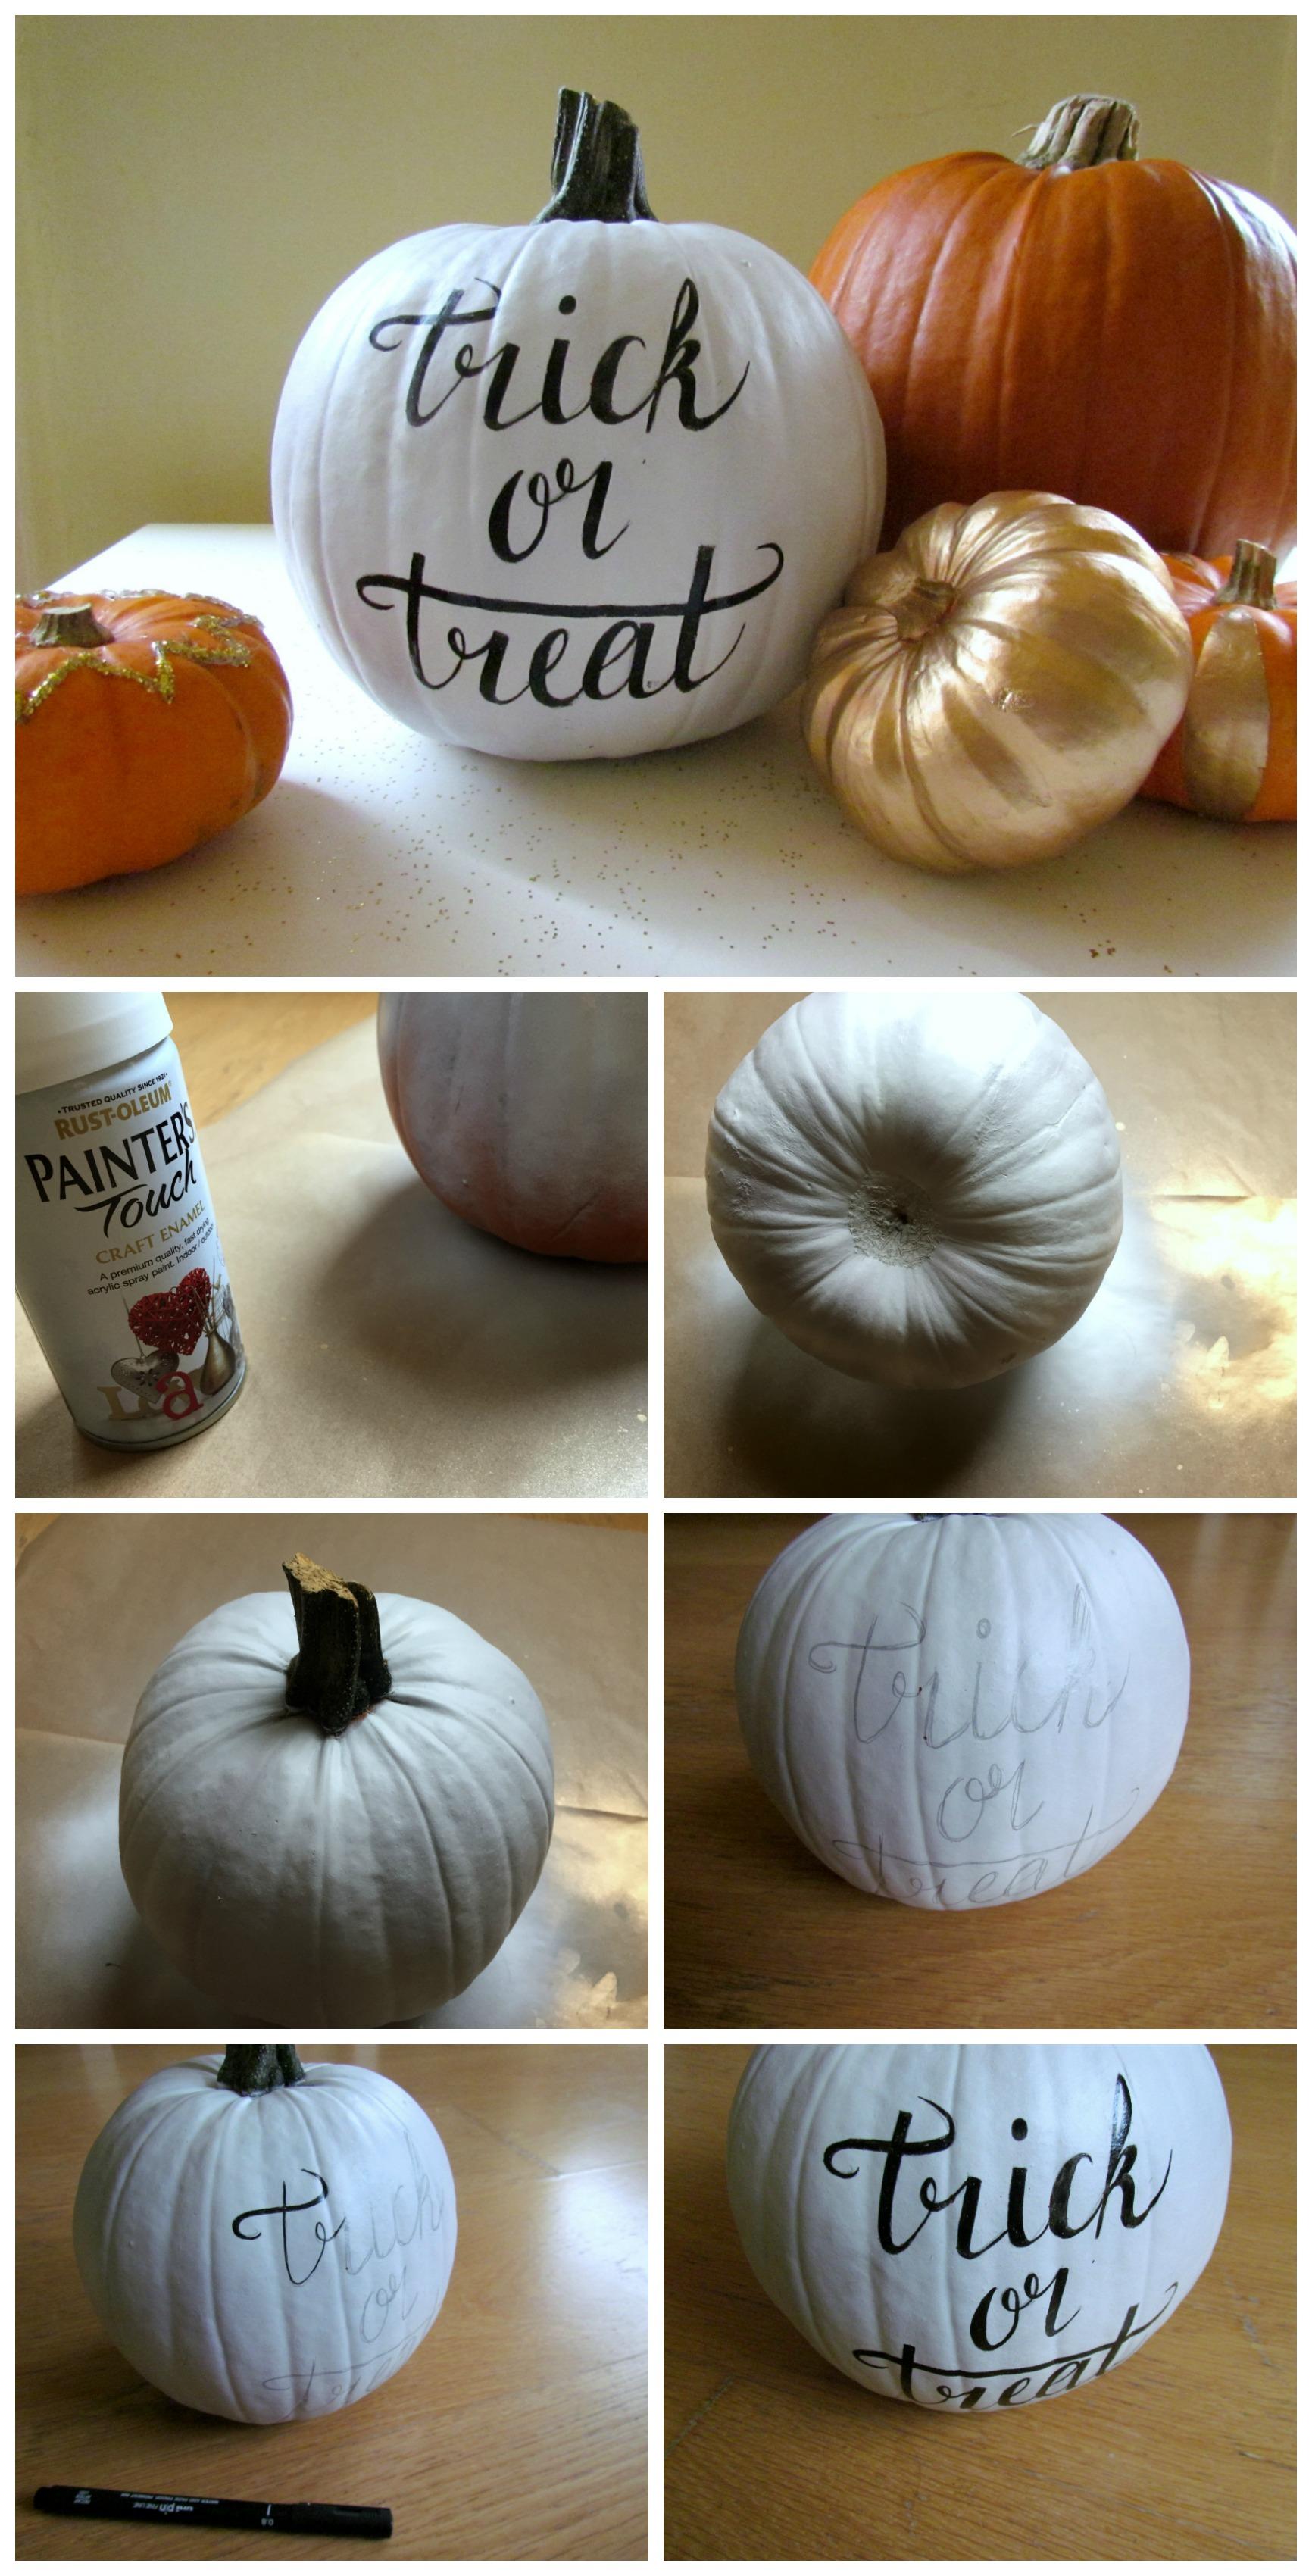 DIY Halloween Hand-Lettered Pumpkin by Isoscella